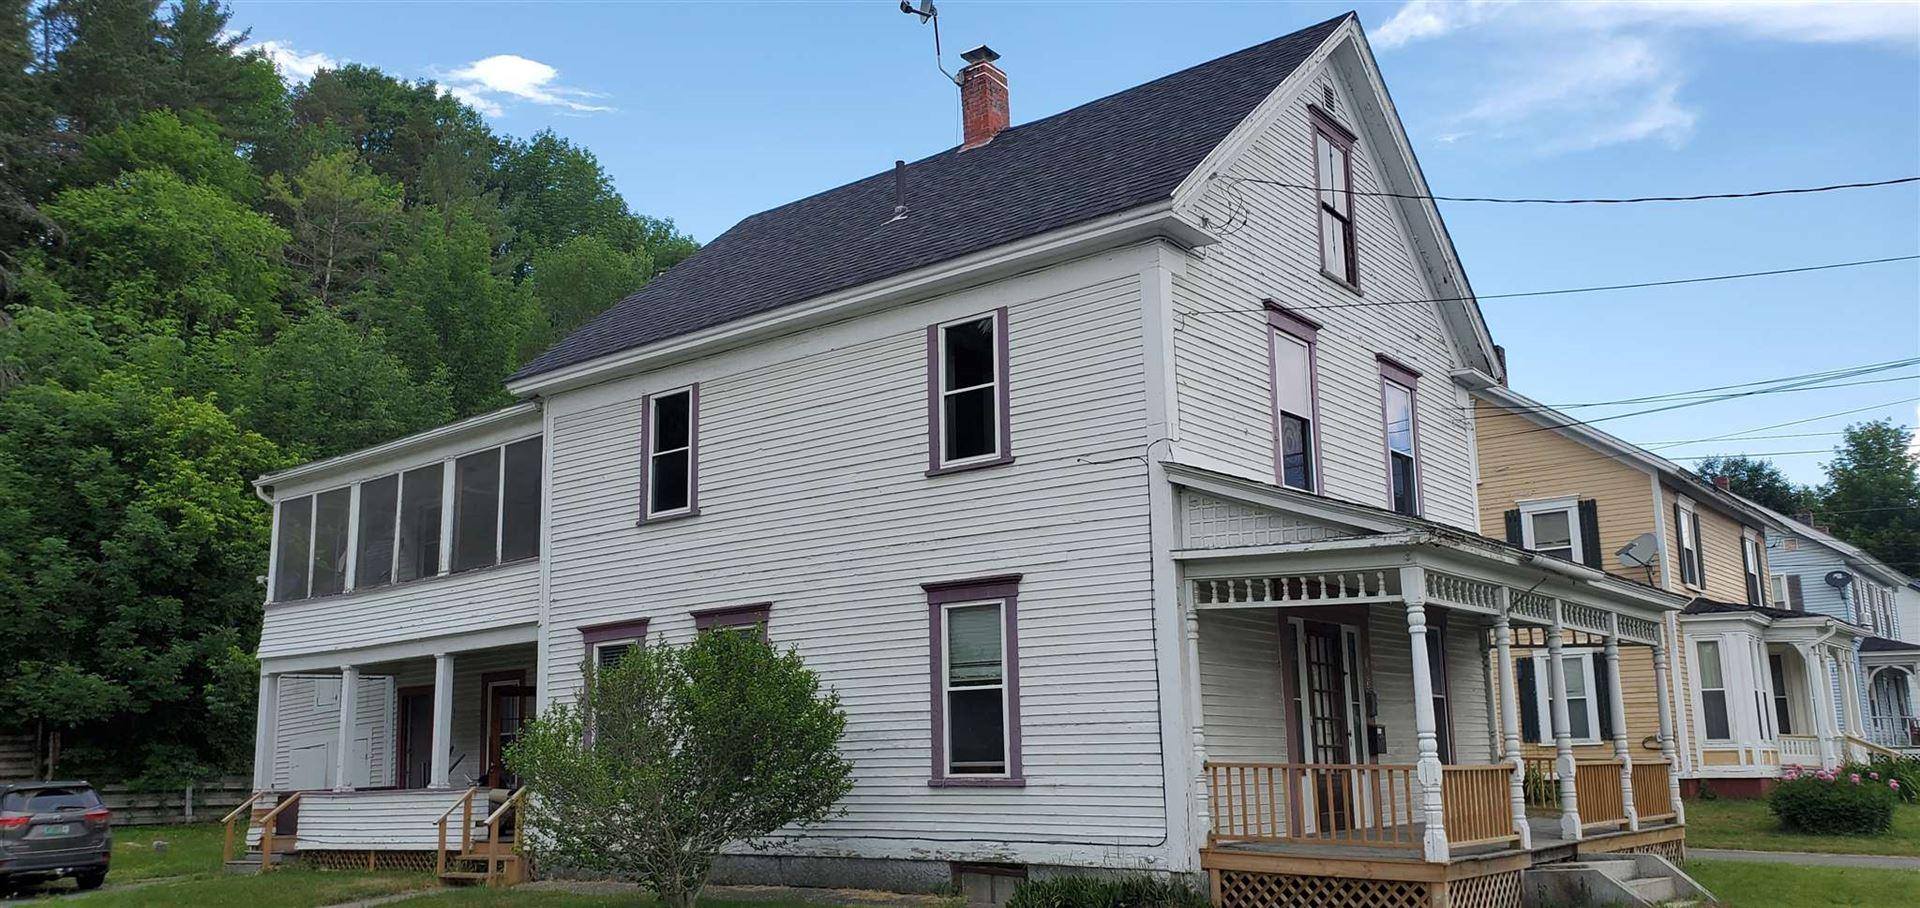 183 Pearl Street, Saint Johnsbury, VT 05819 - MLS#: 4812481